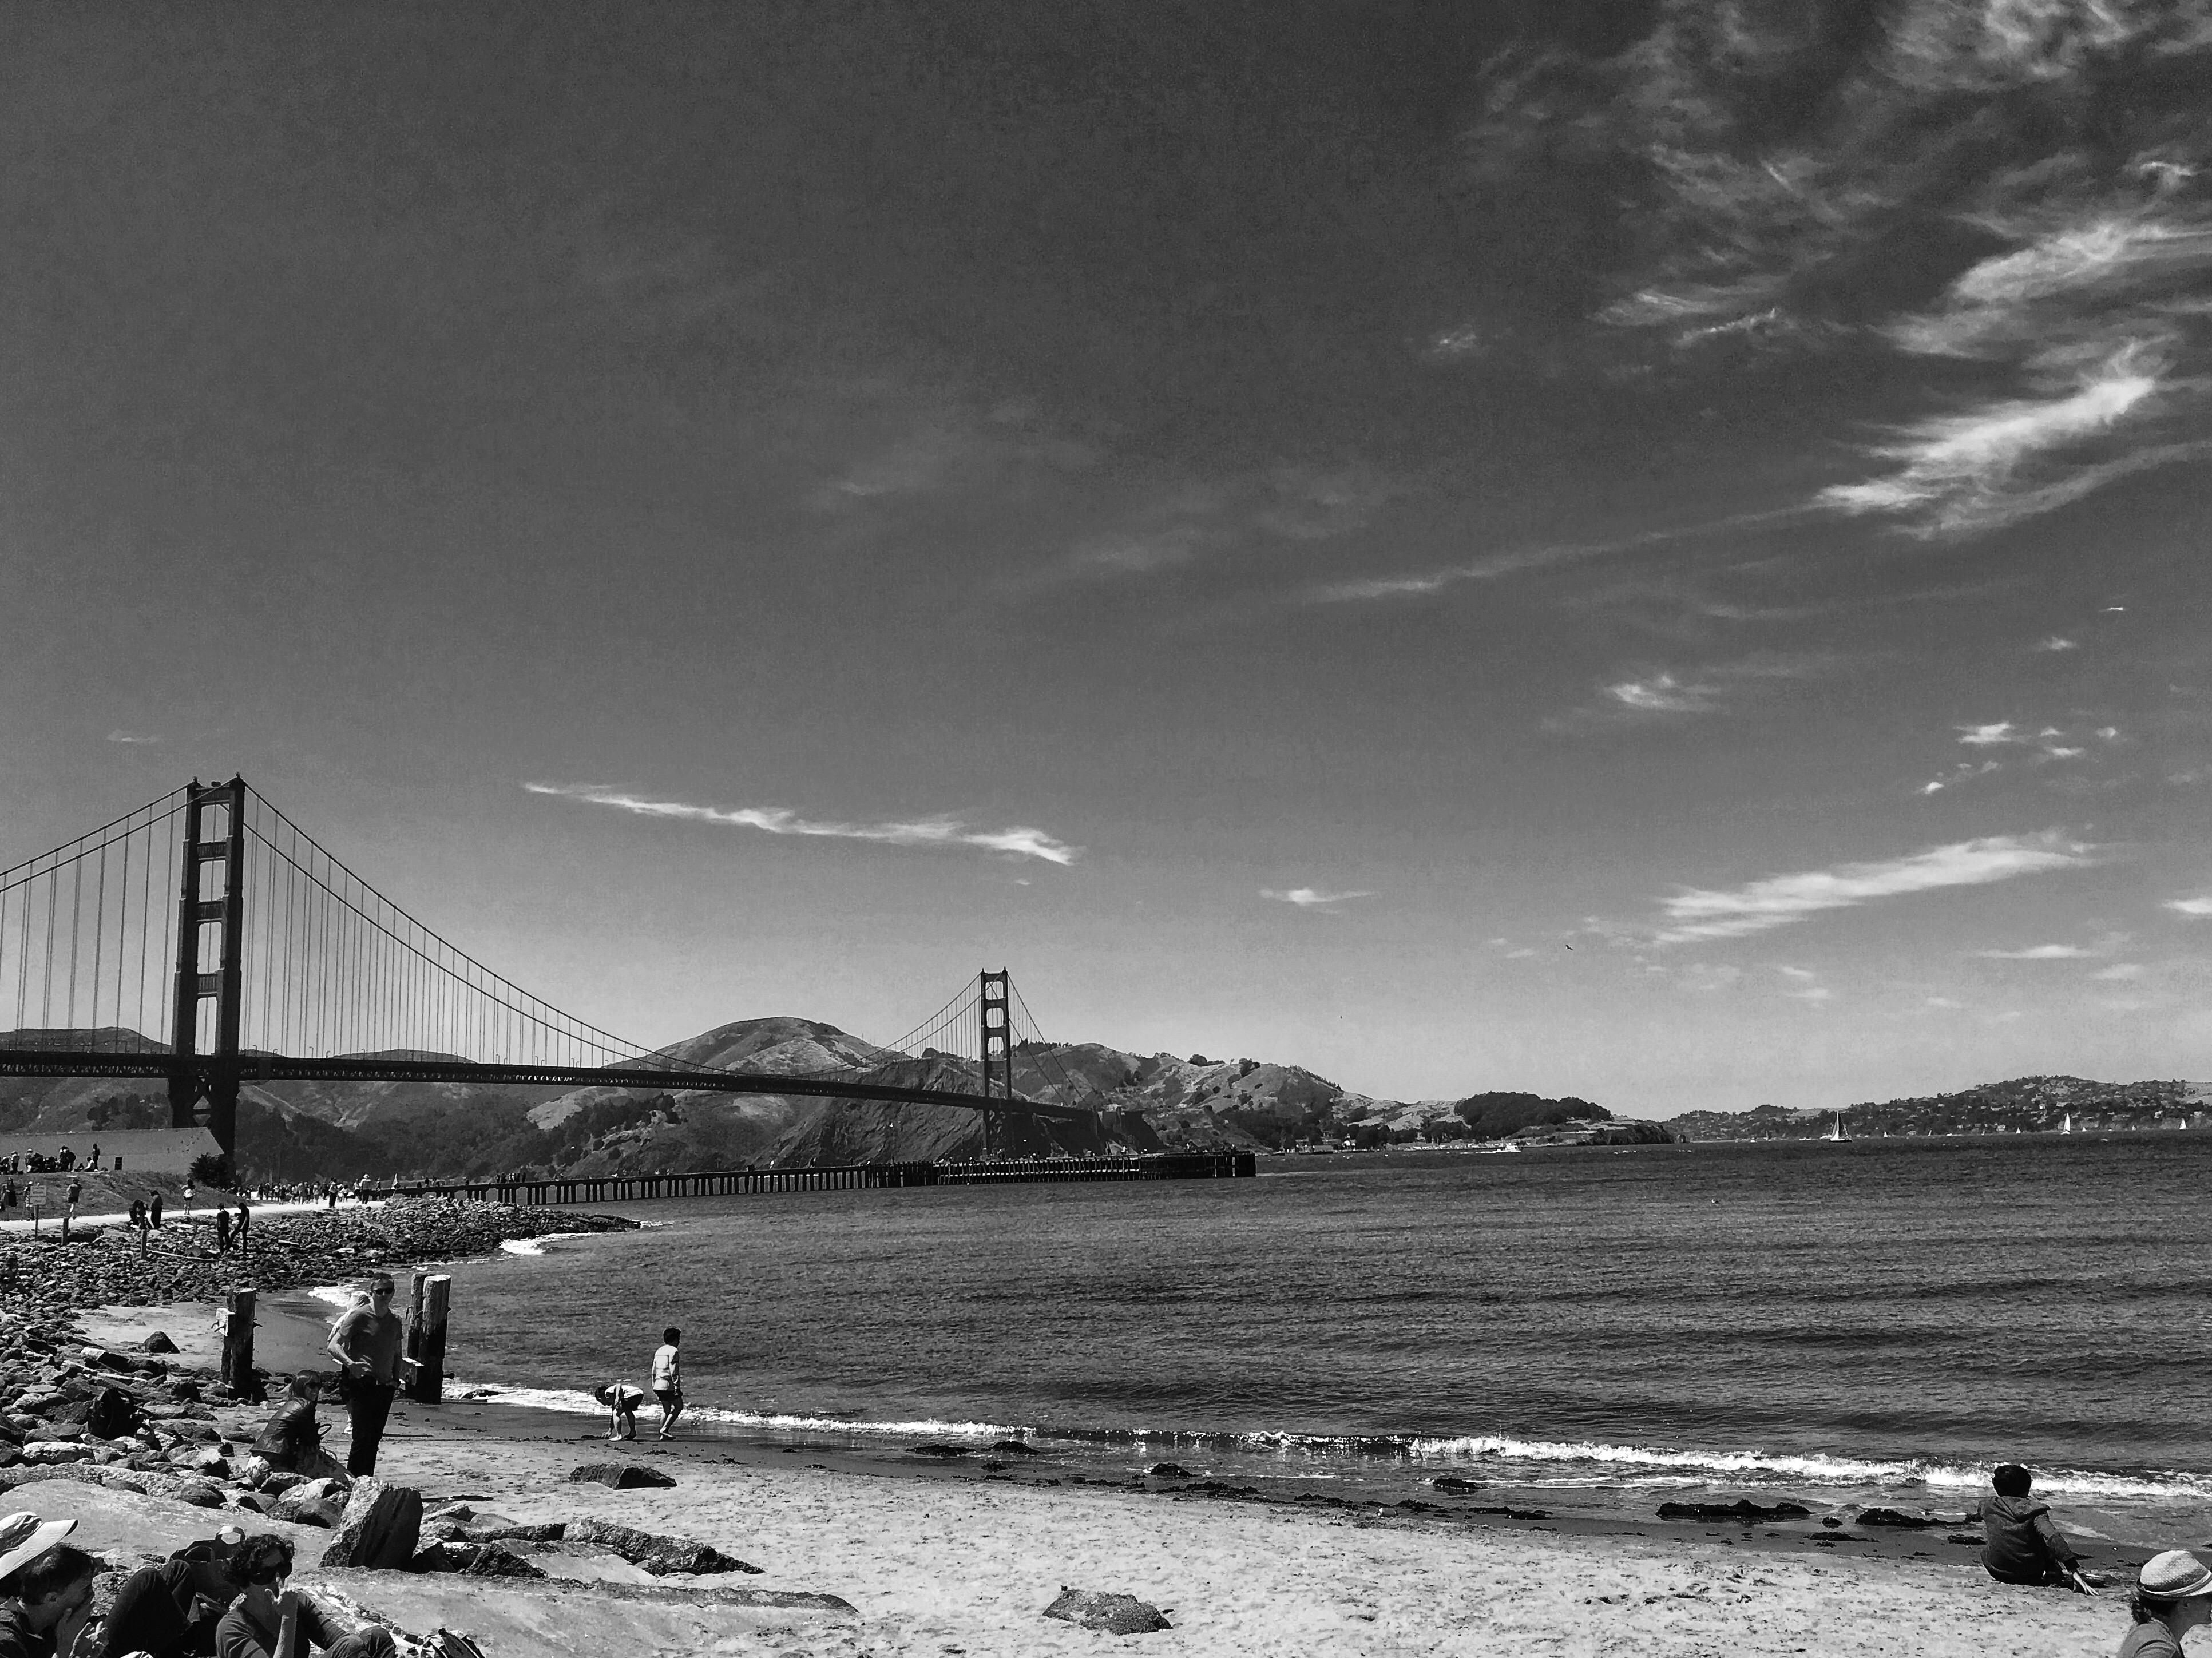 Grayscale Photo of Suspension Bridge